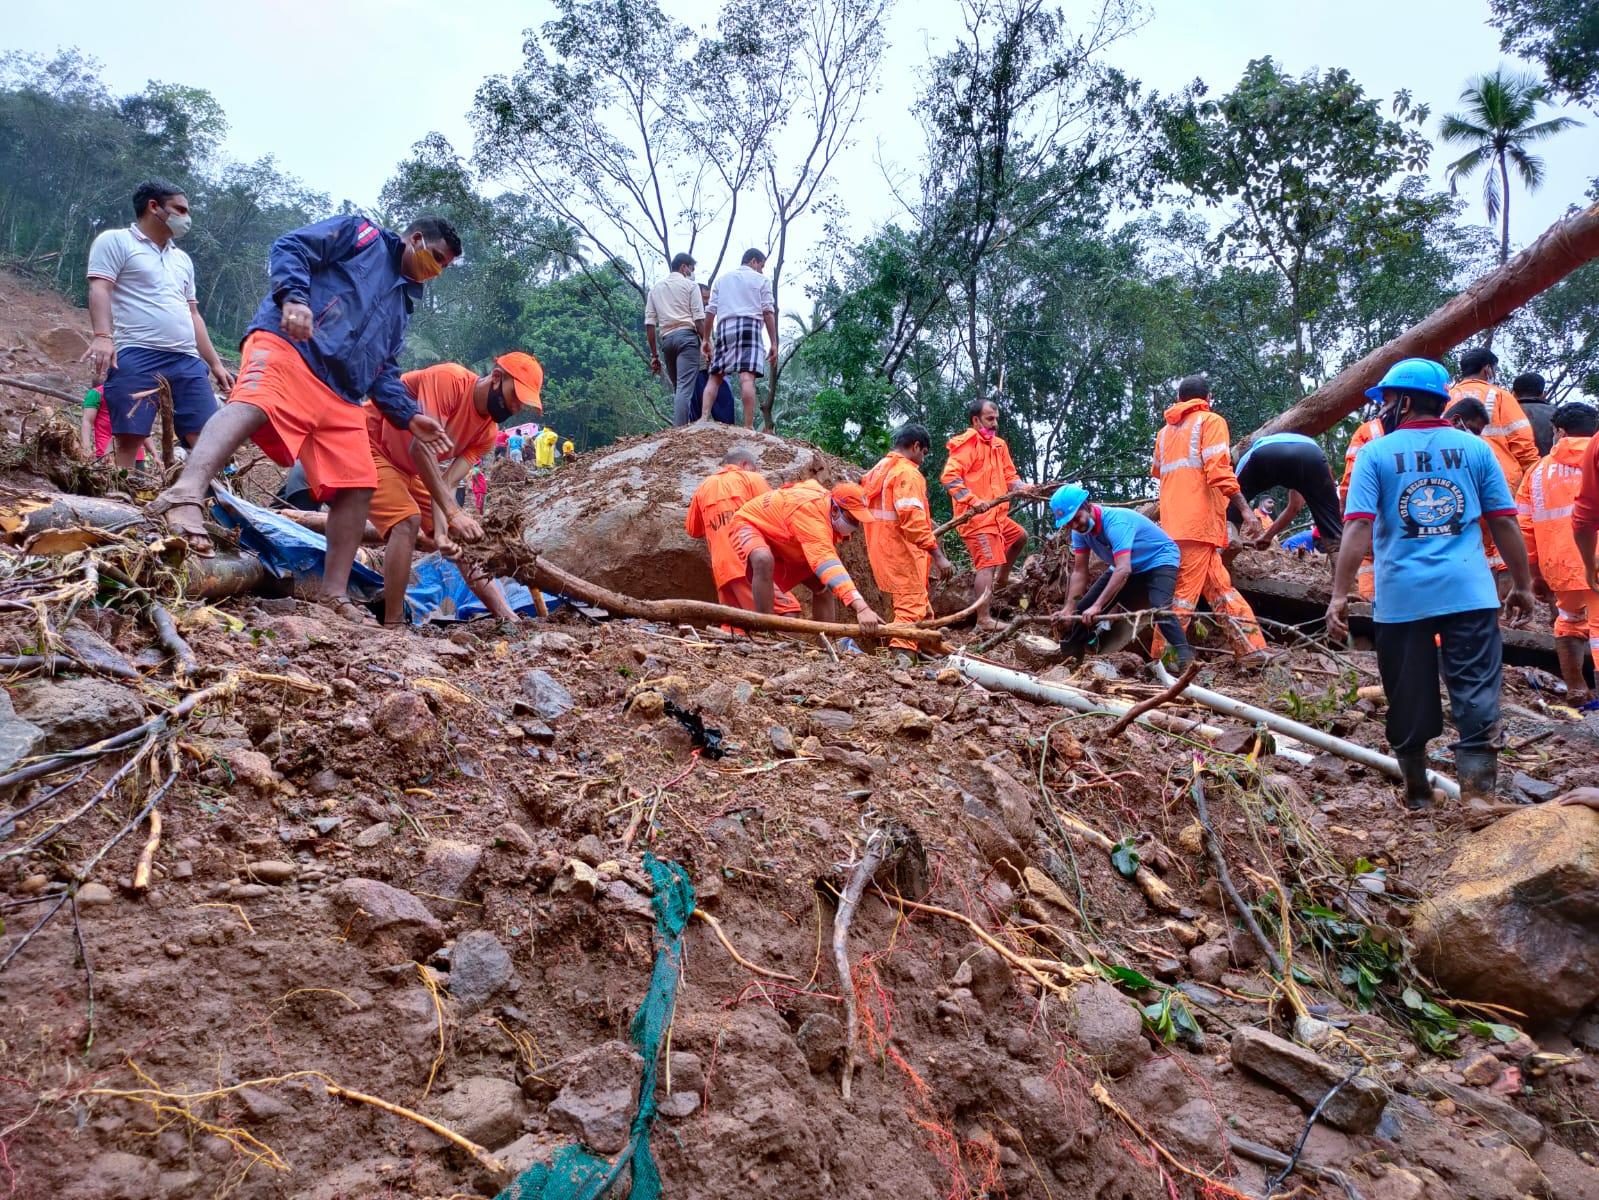 Kerala Floods: 23 Dead; PM Modi Speaks to CM Vijayan, Army, NDRF Teams Deployed